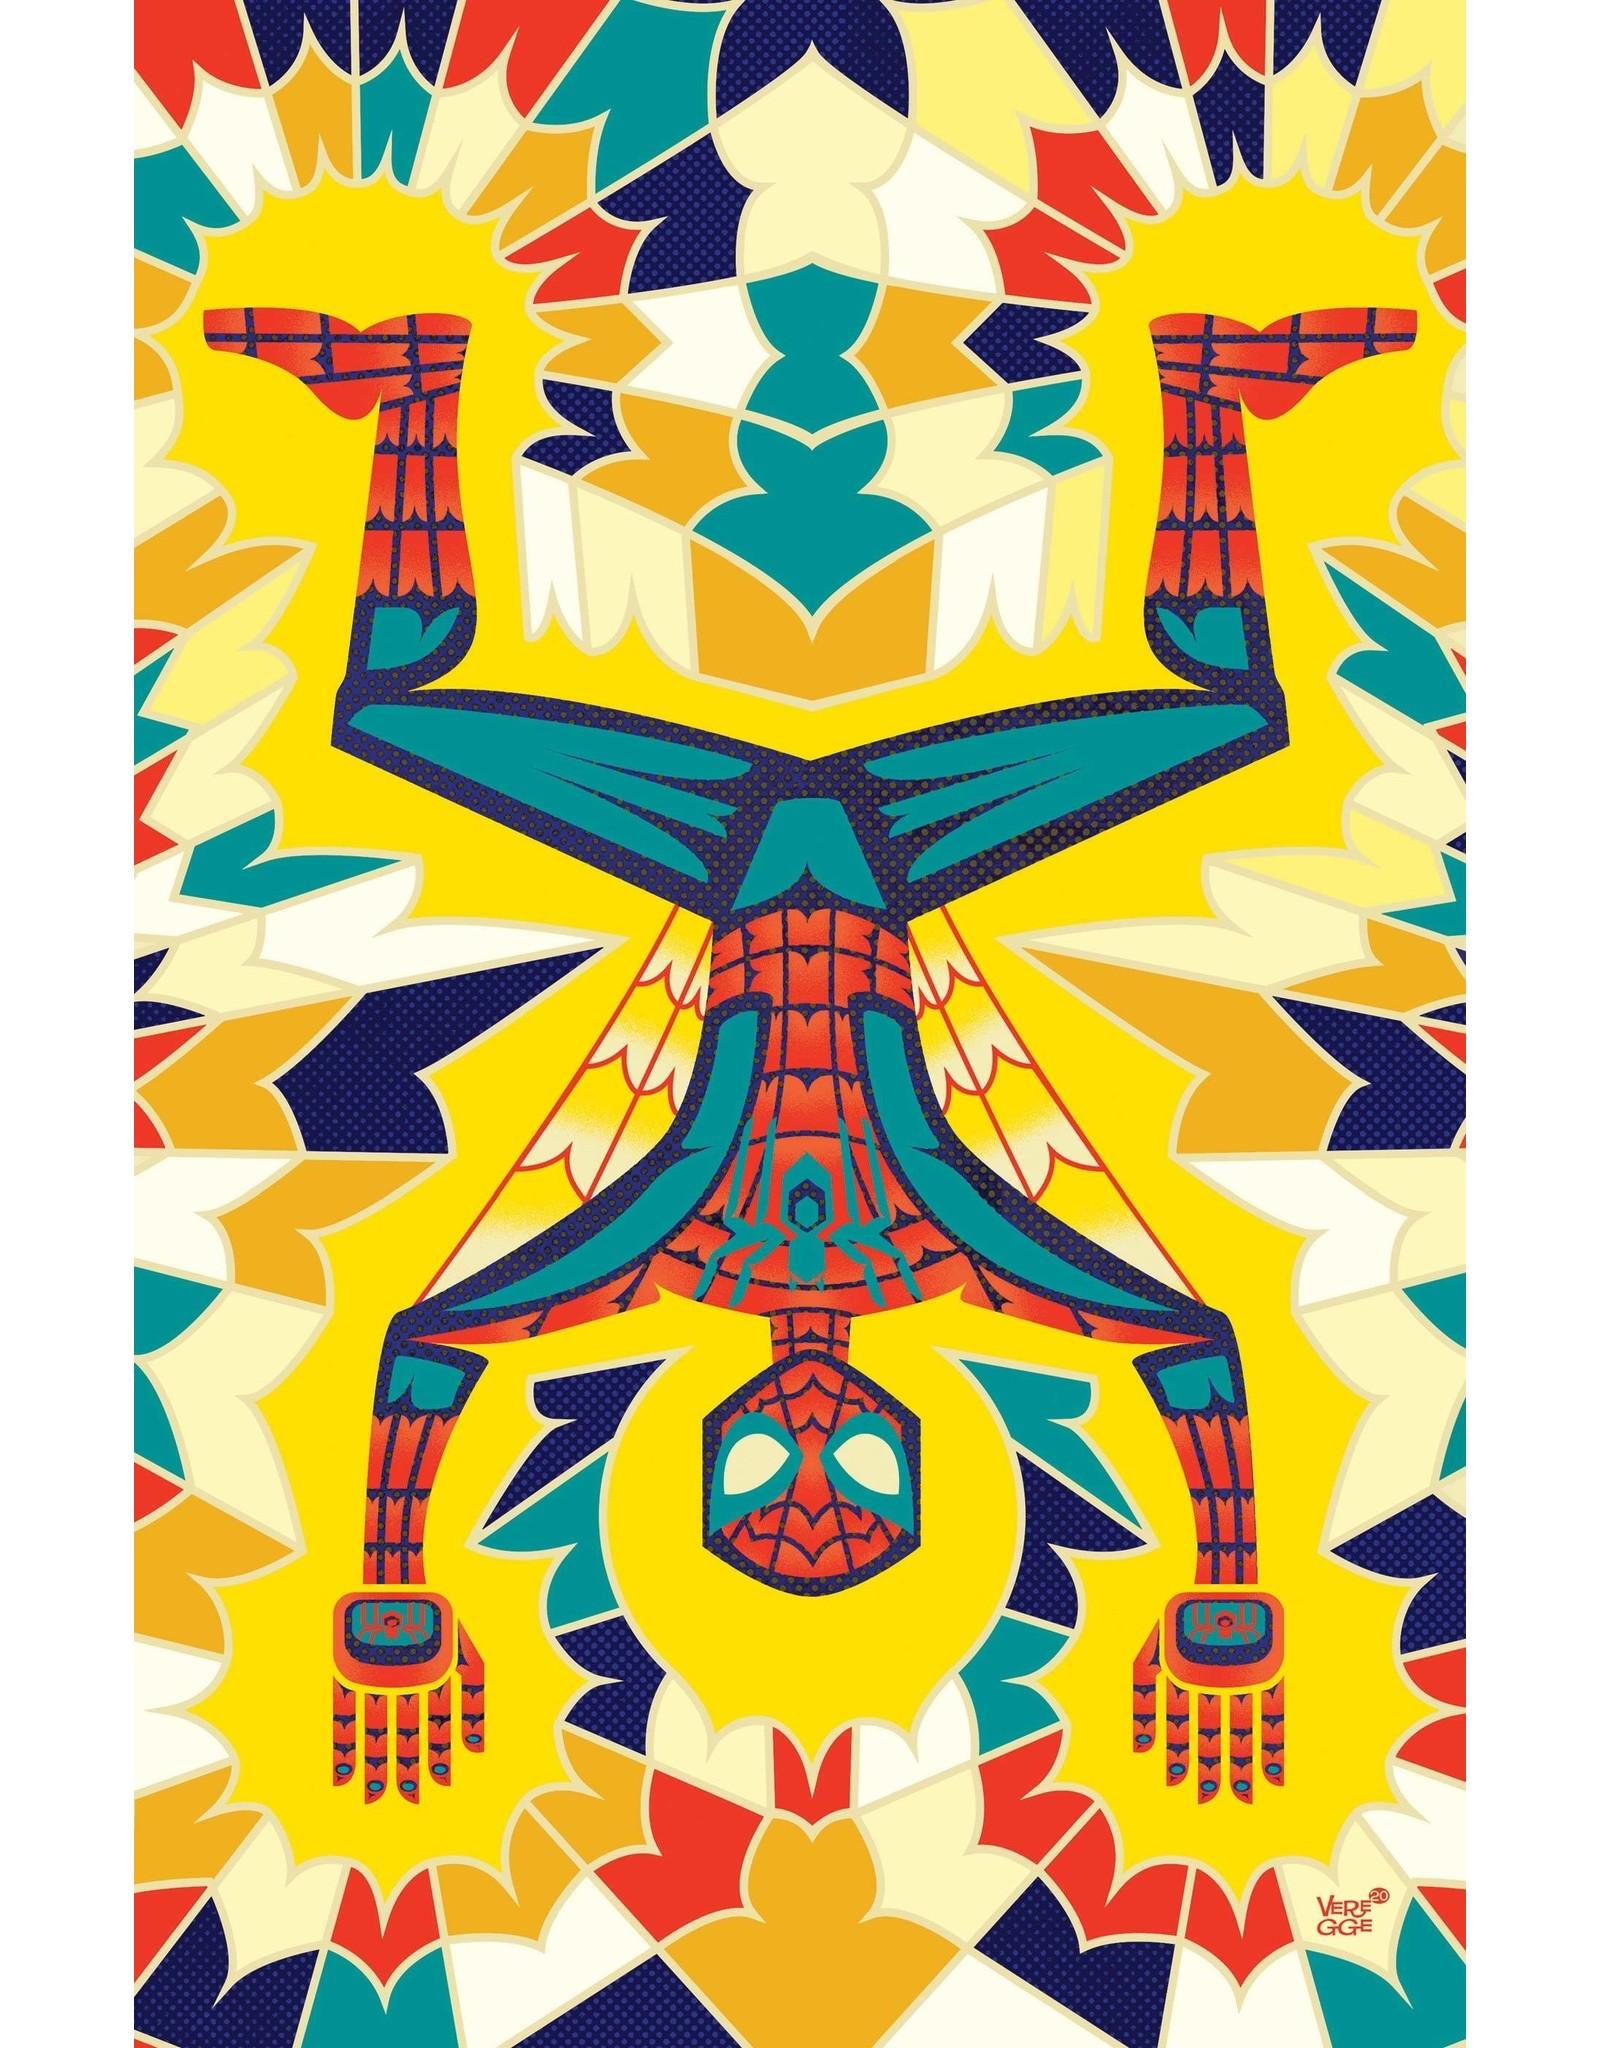 MARVEL COMICS AMAZING SPIDER-MAN #52 VEREGGE SPIDER-MAN VAR LAST